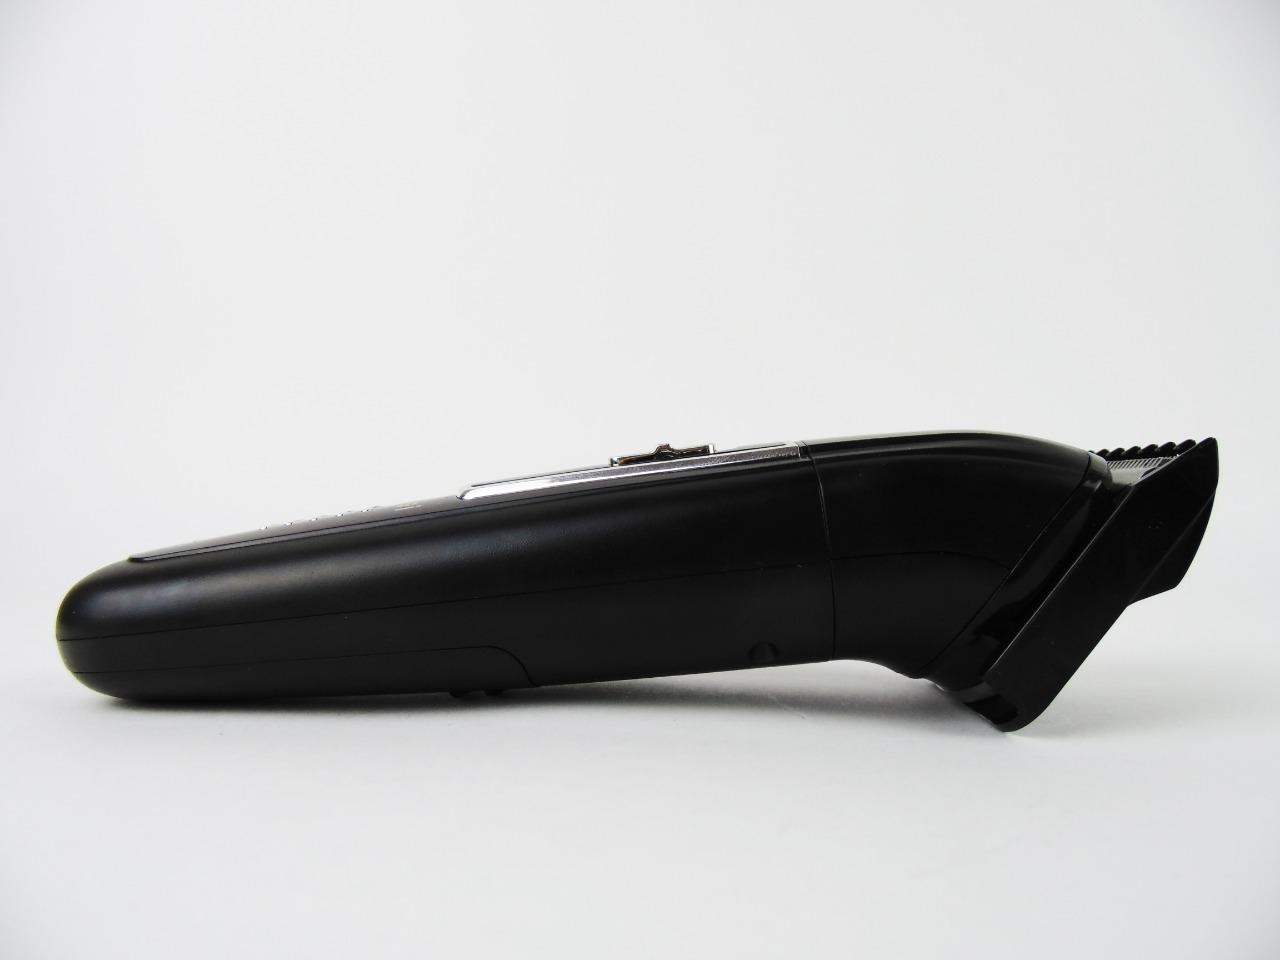 Km-6558 ماكينة كهربائية لقص الشعر 3 فى 1 - أسود